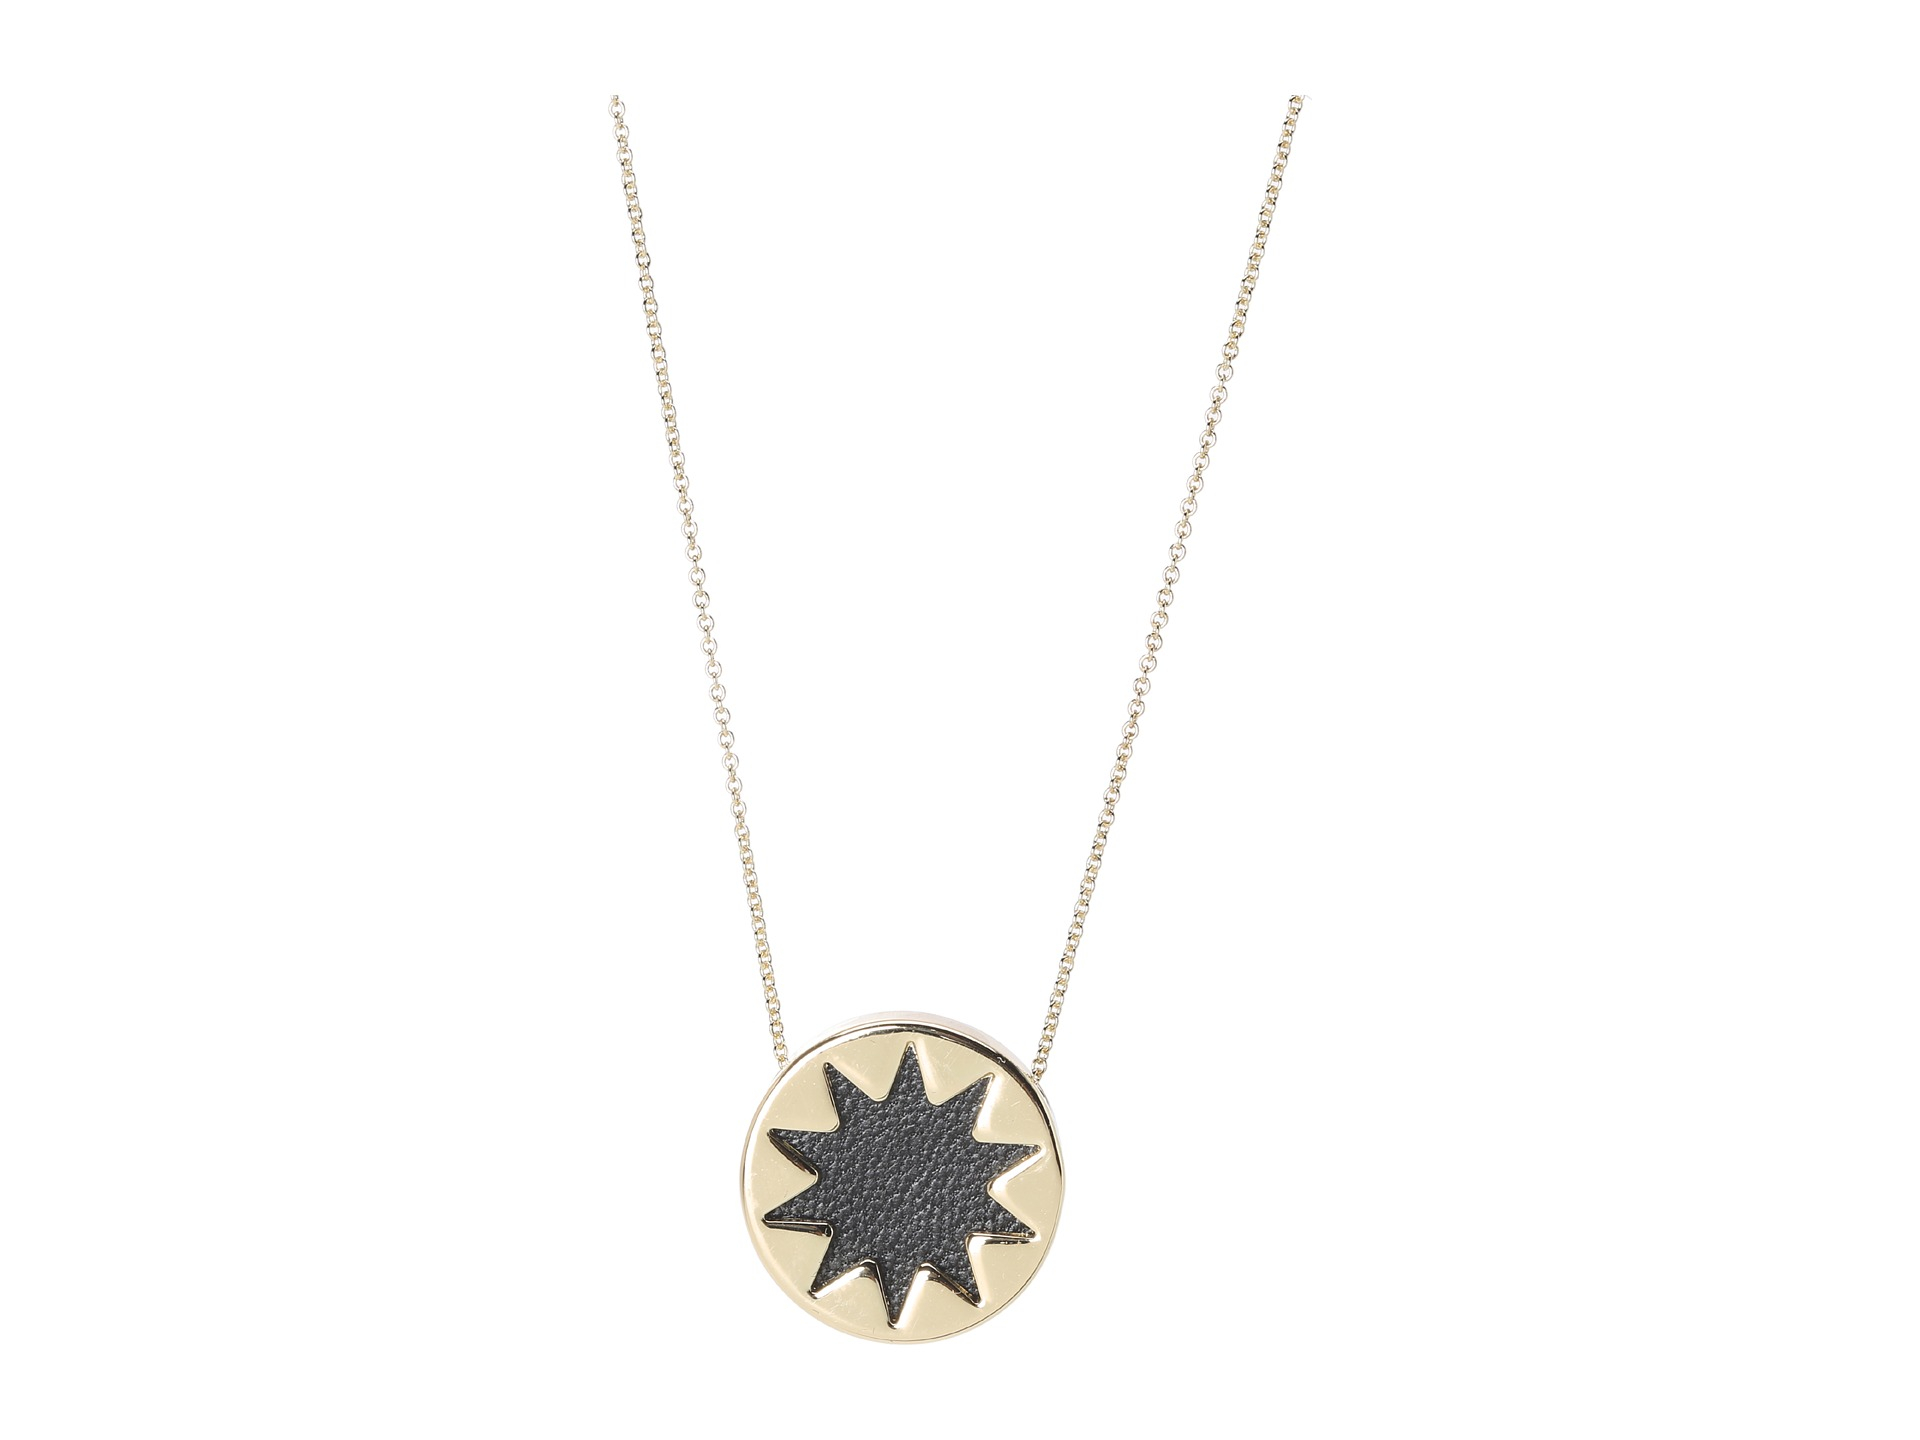 house of harlow 1960 mini sunburst pendant necklace in